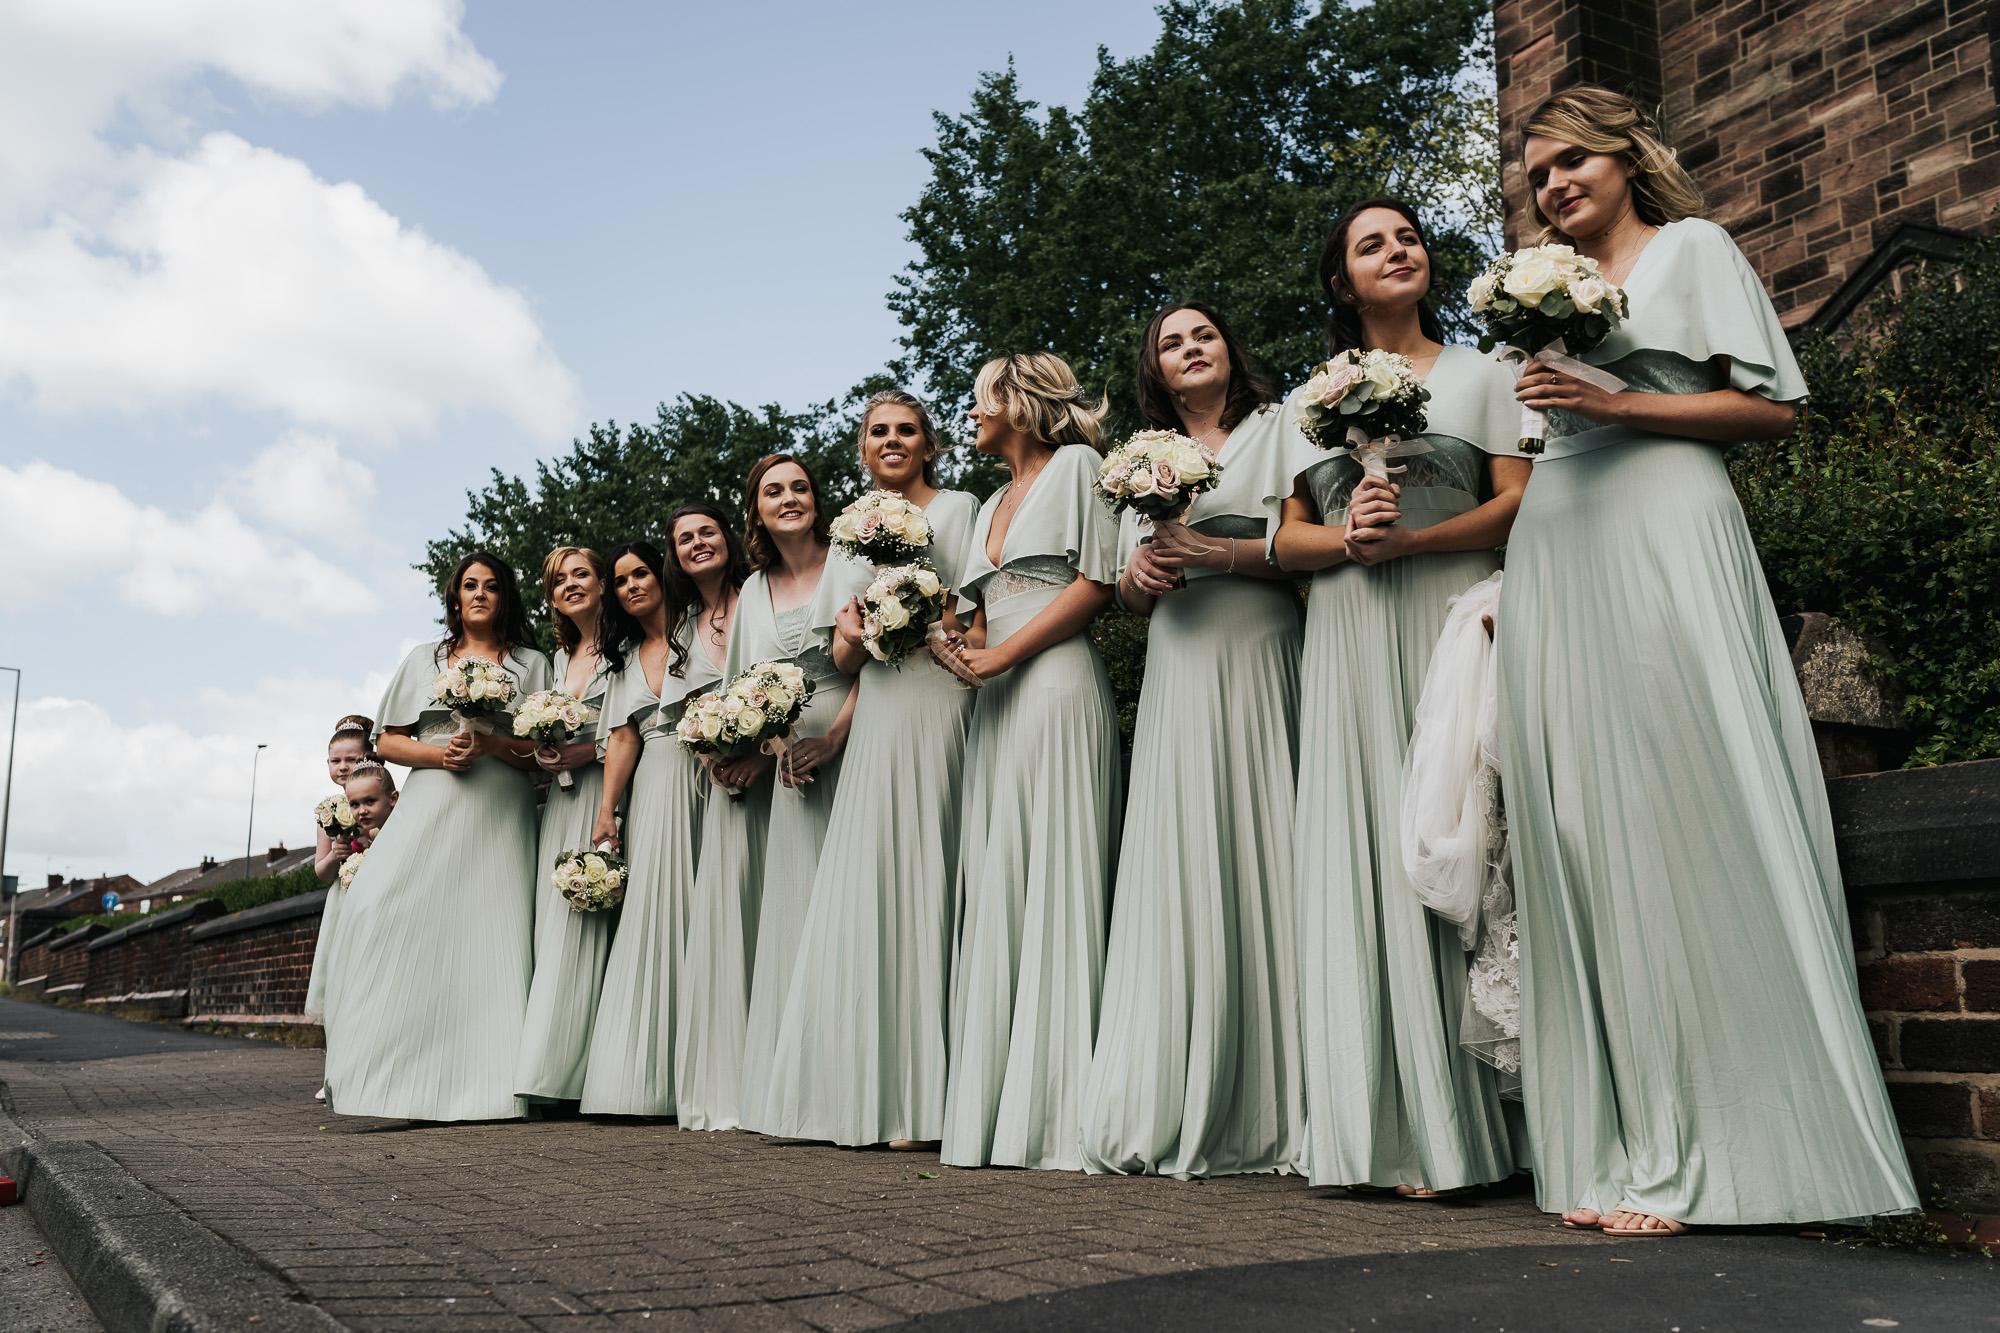 Rivington Hall Barn Wedding PHotographer lancashire wedding photography (11 of 34).jpg